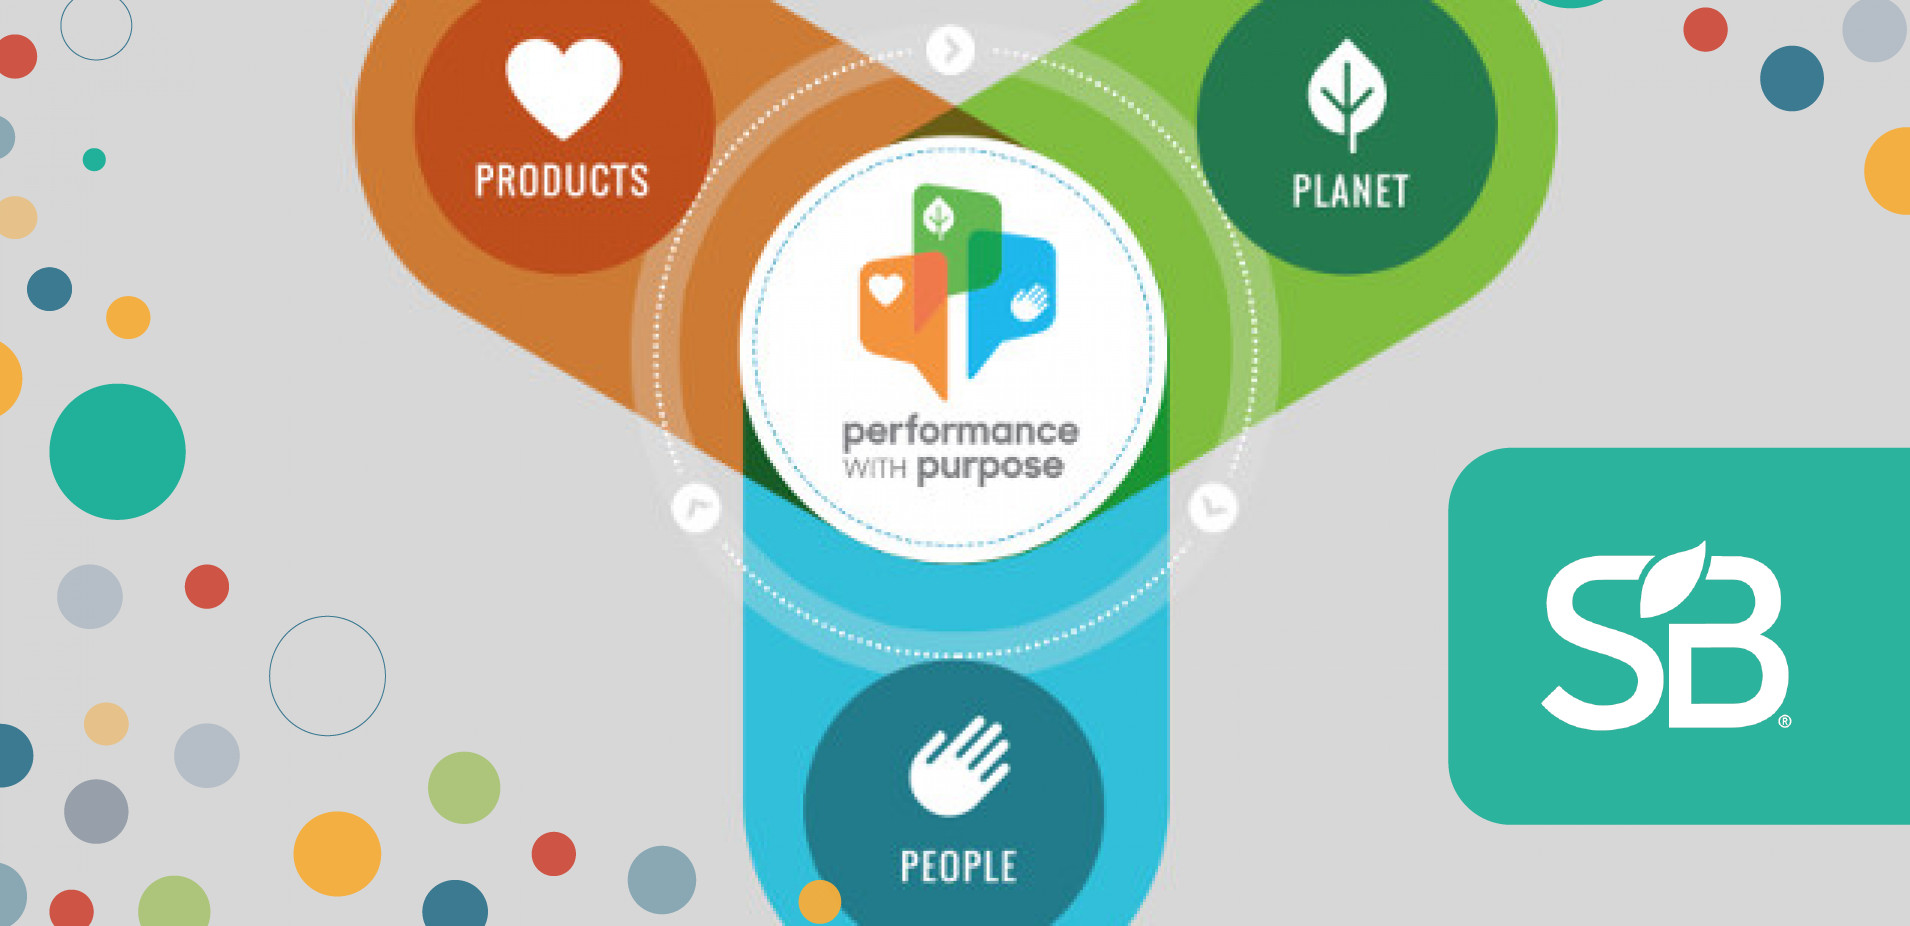 PepsiCo's 2025 Sustainability Agenda Designed to Meet